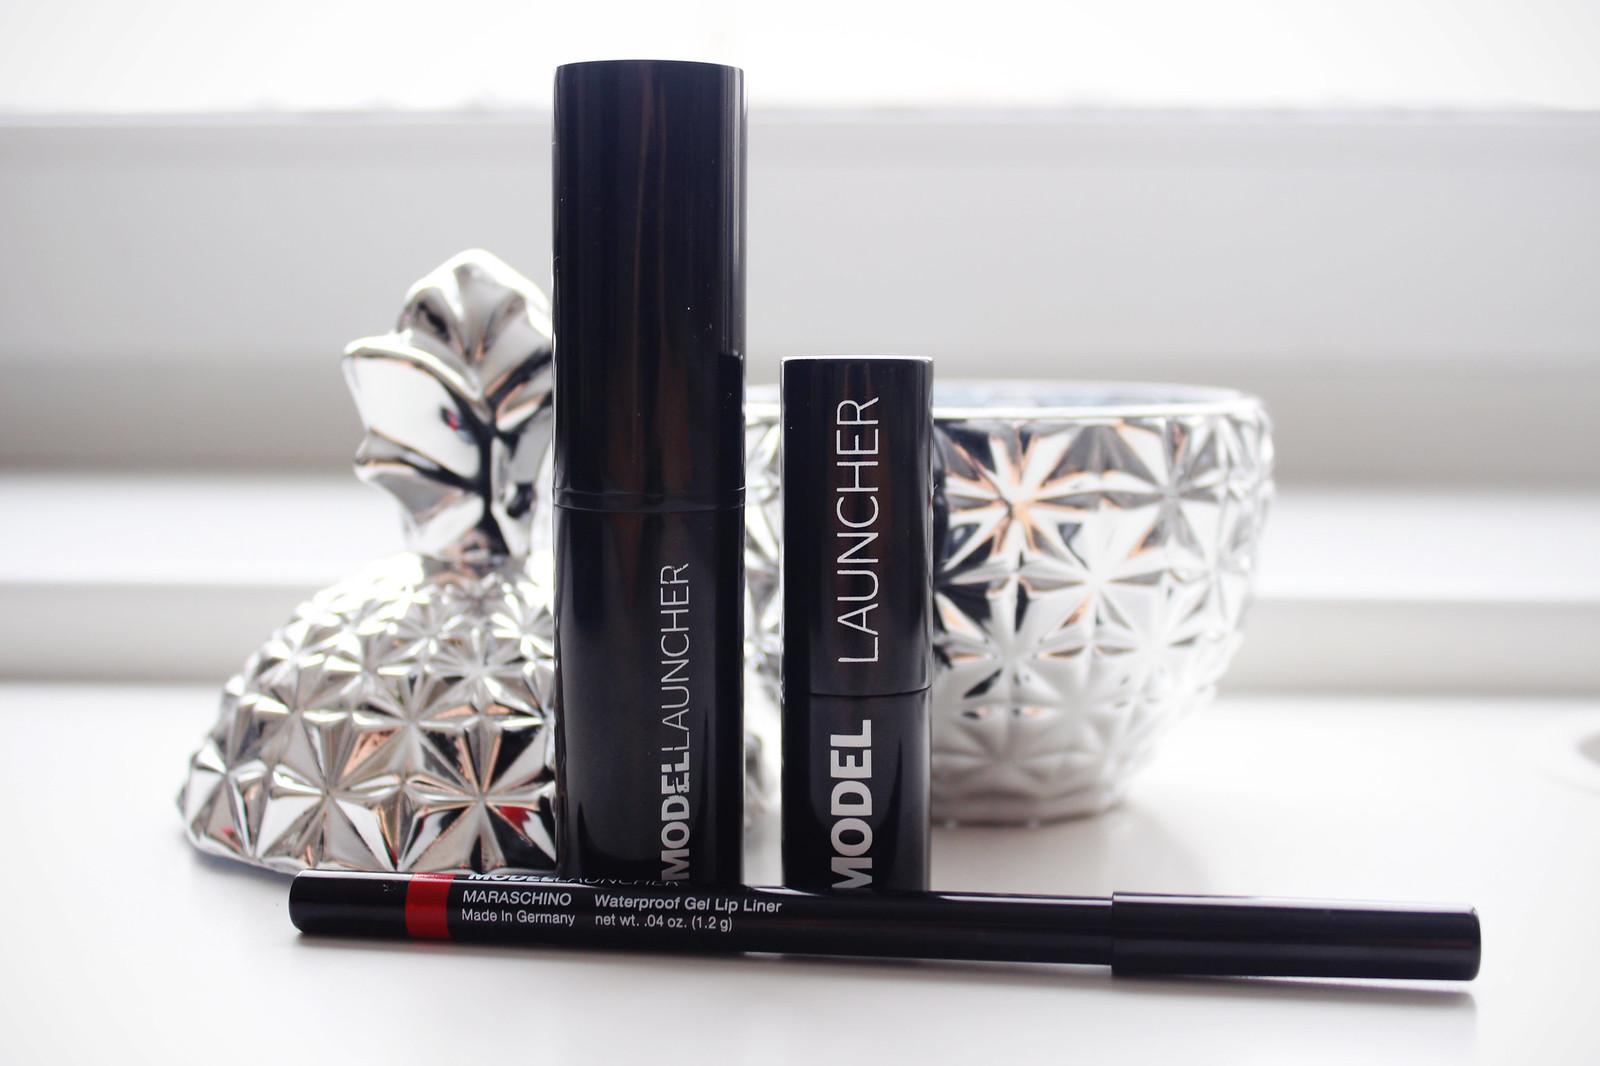 Model Launcher makeup review